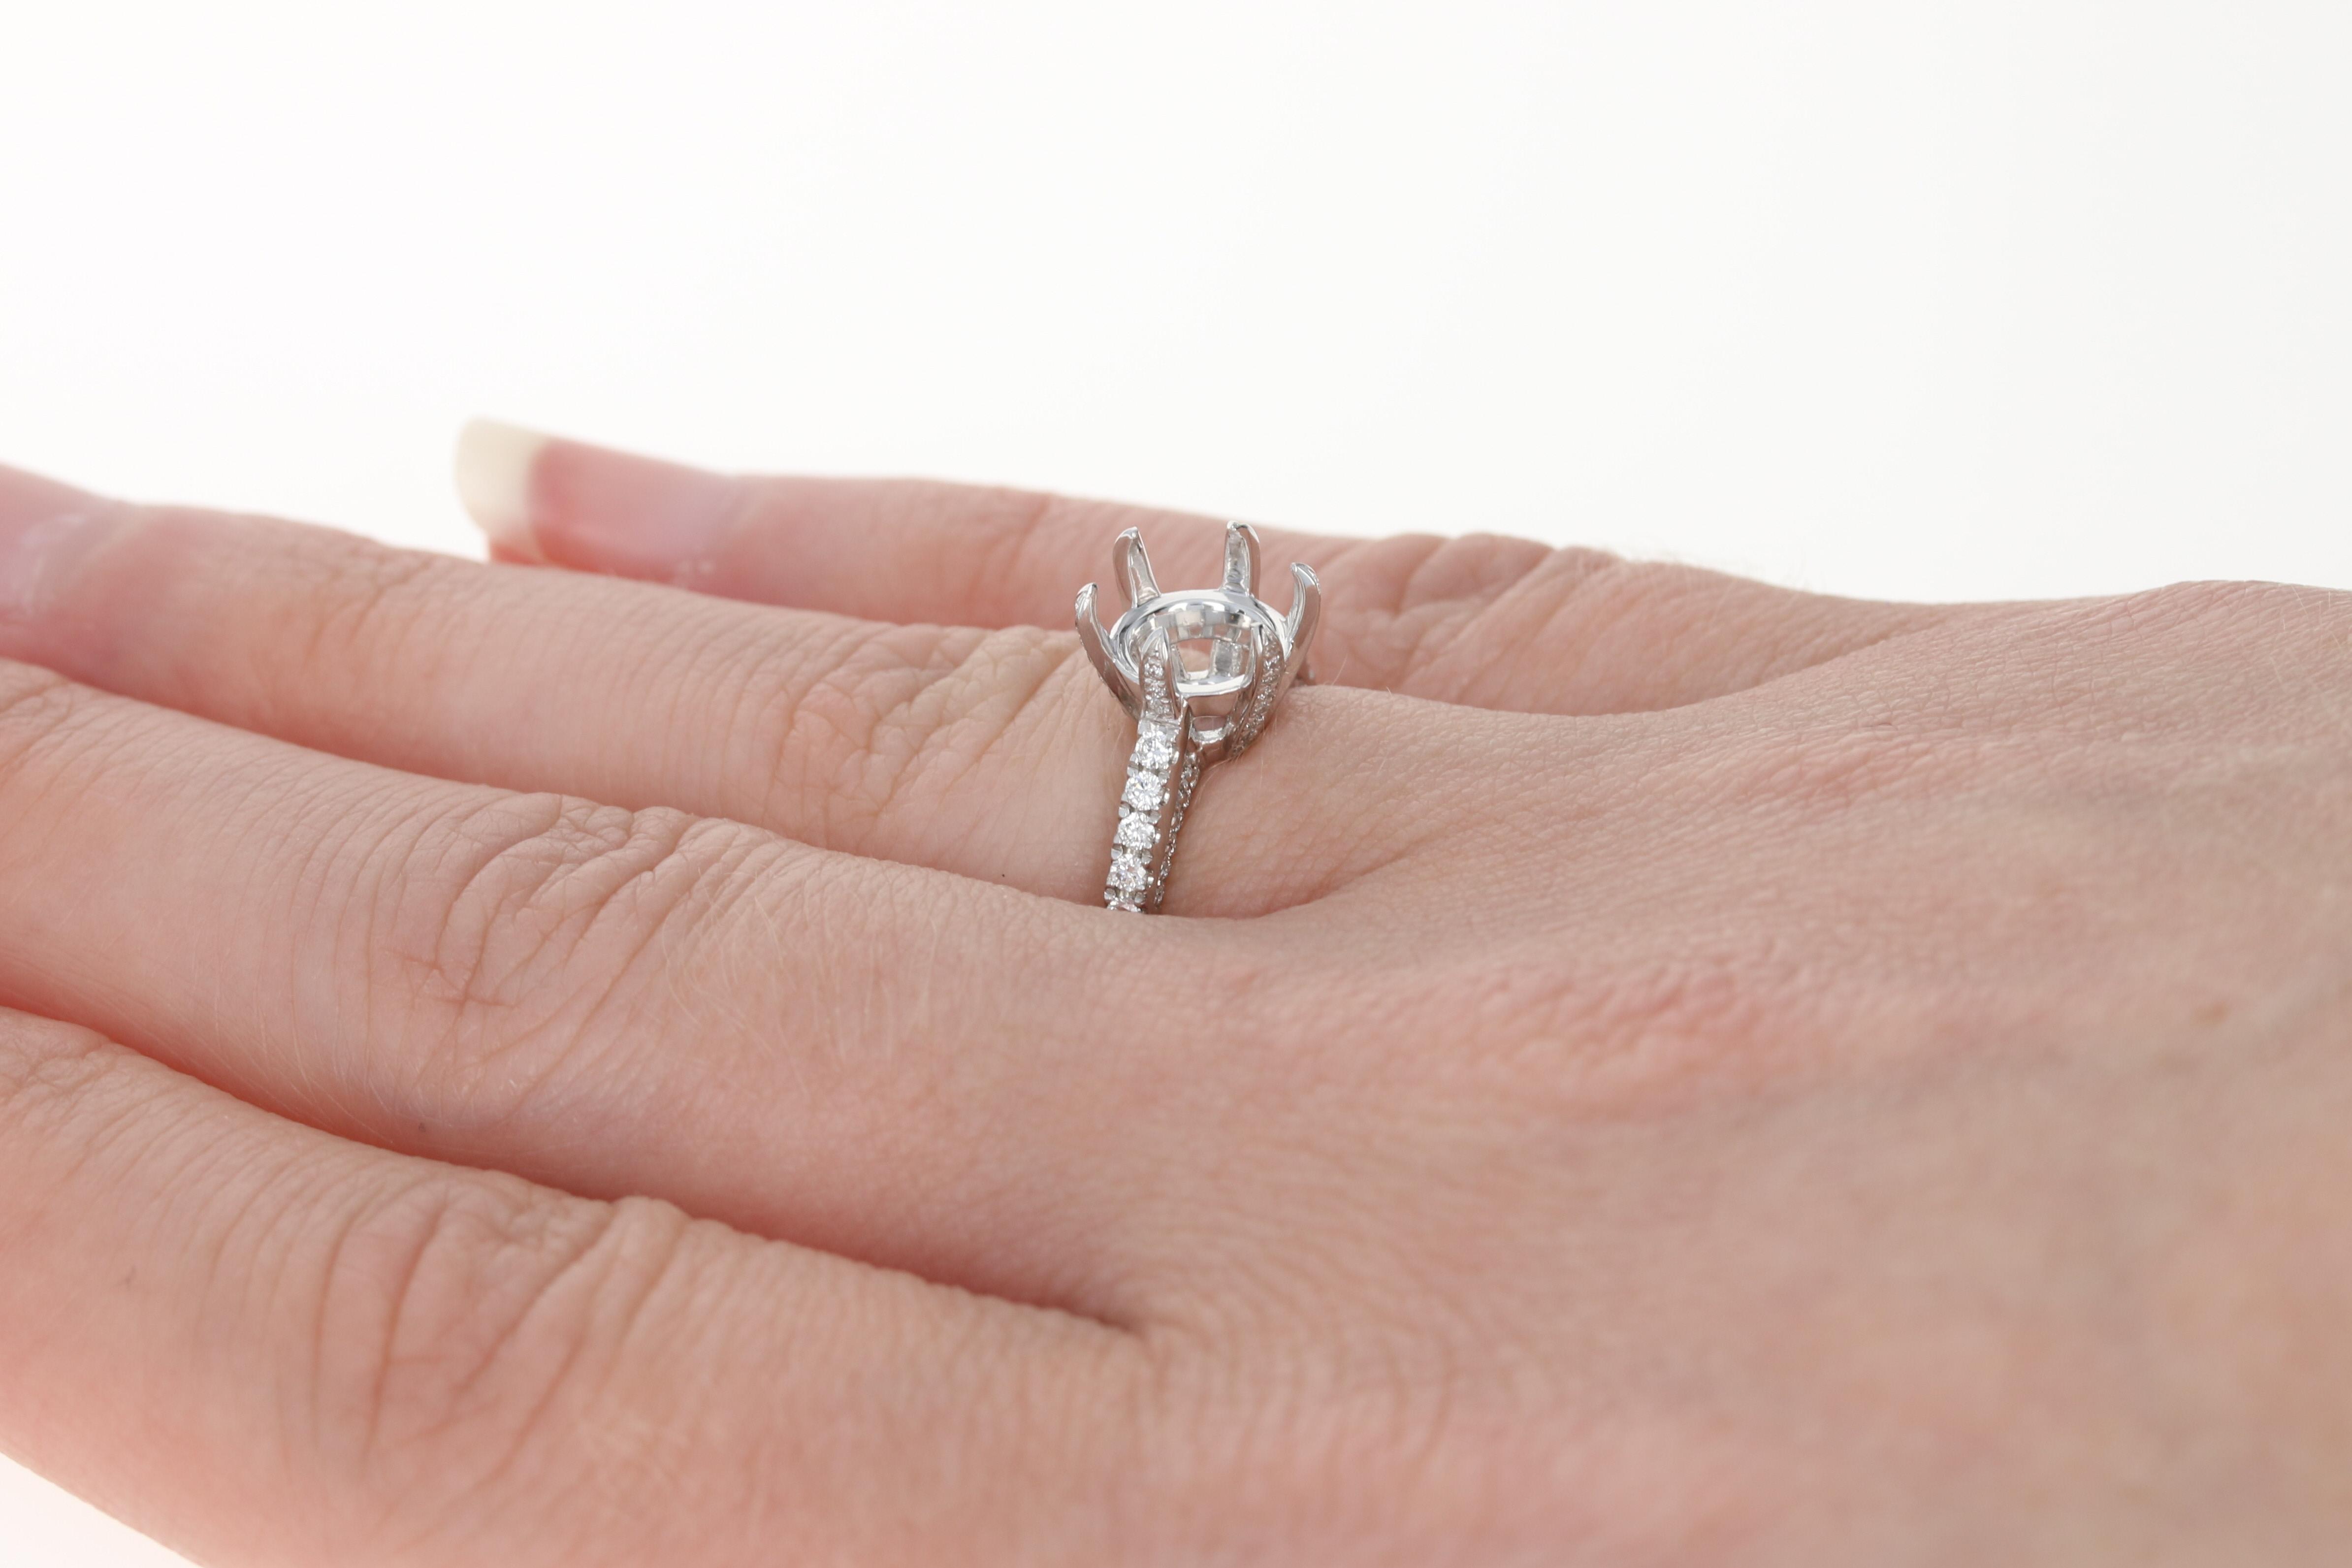 NEW Semi-Mount Engagement Ring - 950 Platinum Diamond Accents Round ...